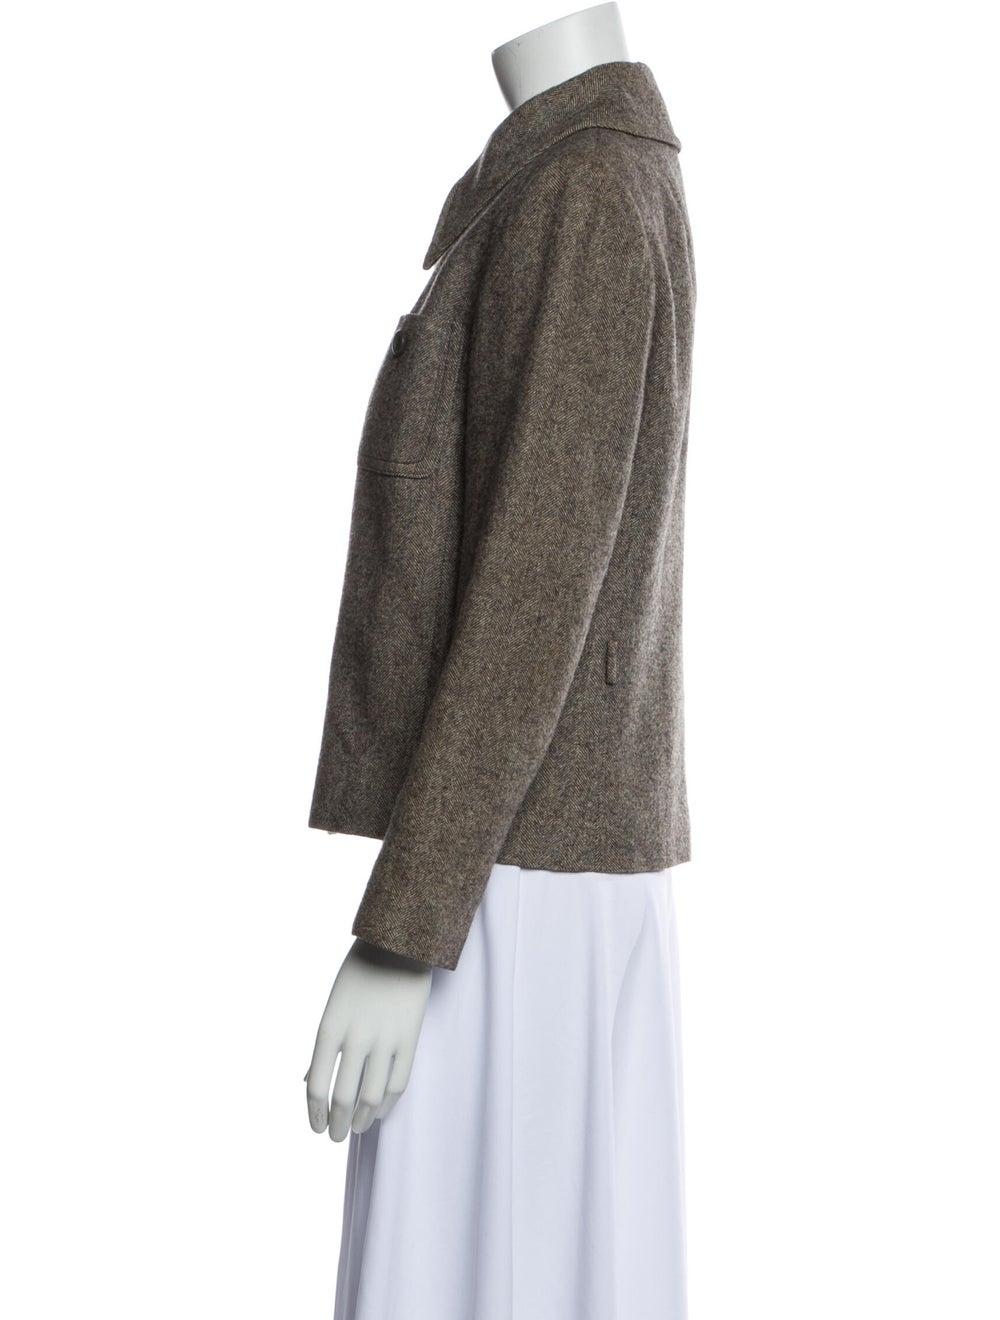 Christian Dior Vintage 1980's Blazer Brown - image 2